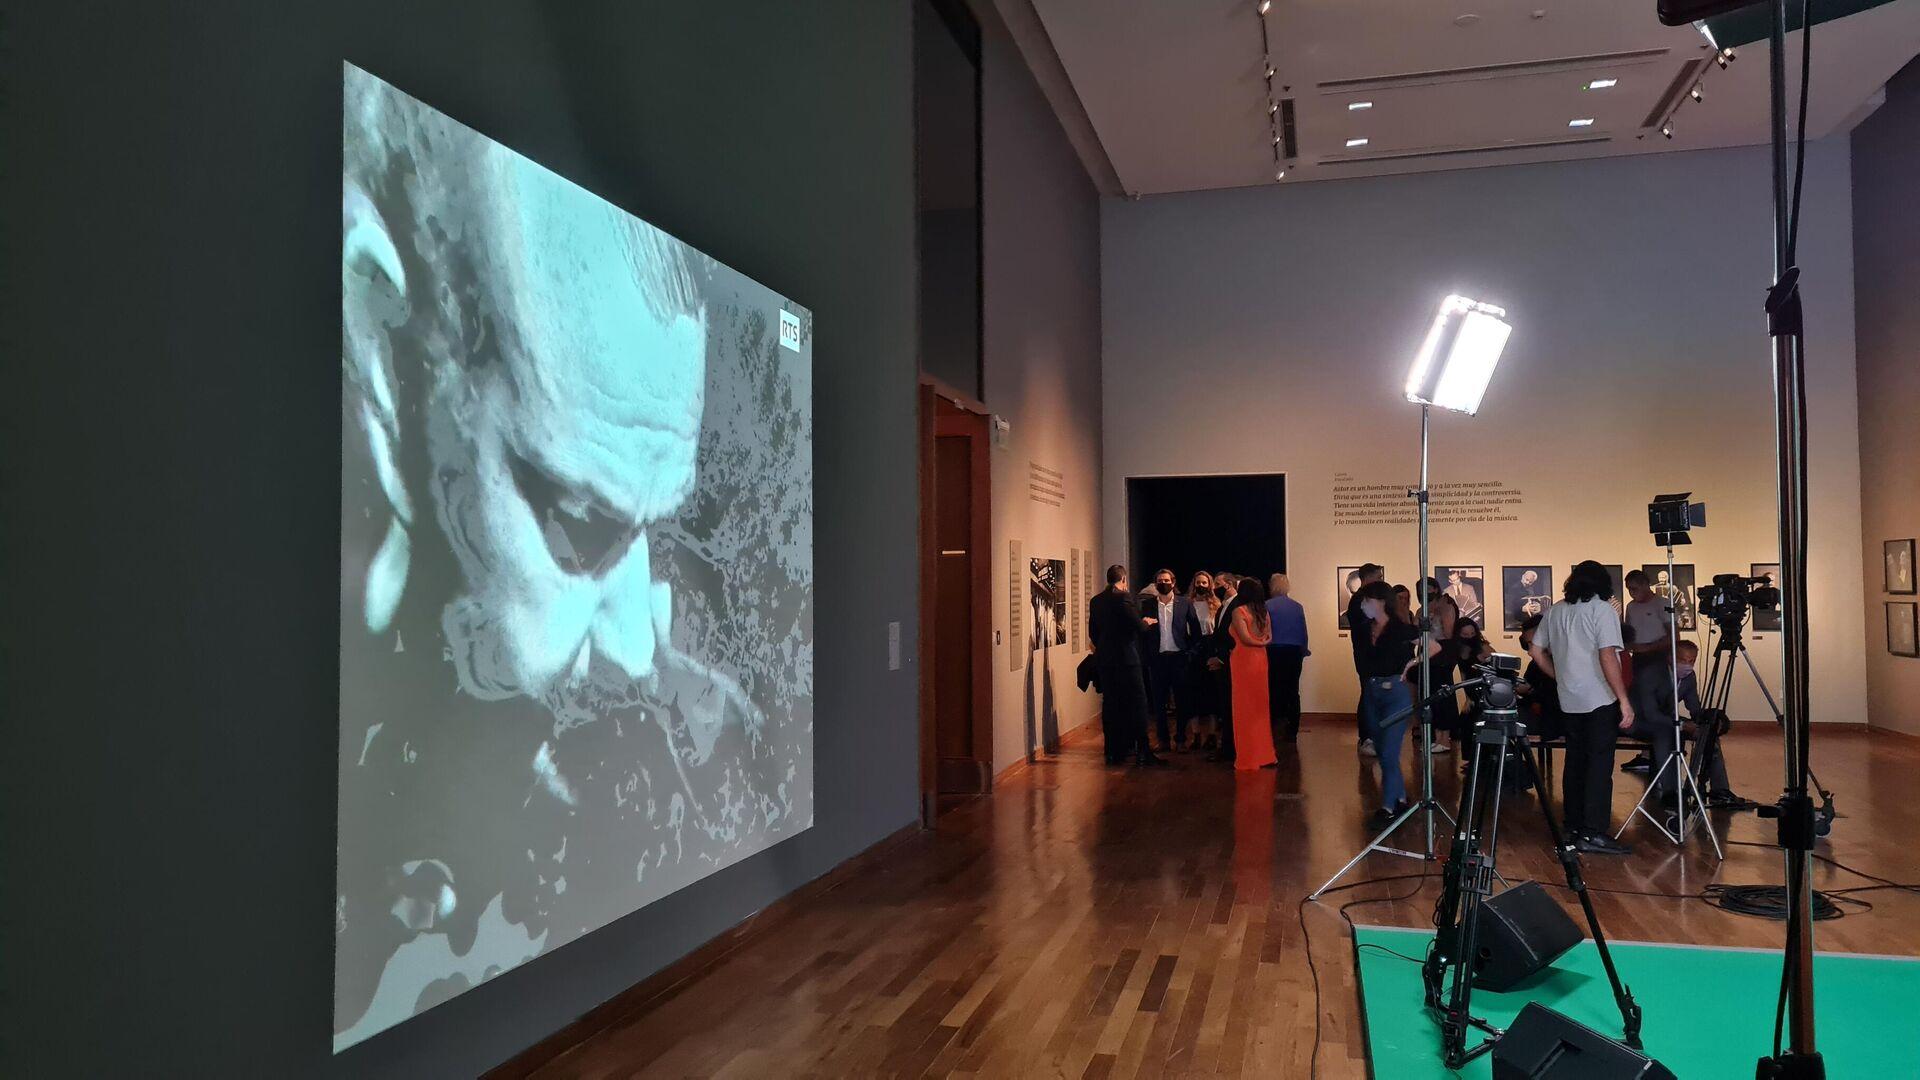 Muestra de Ástor Piazzolla en Centro Cultural Kirchner - Sputnik Mundo, 1920, 12.03.2021